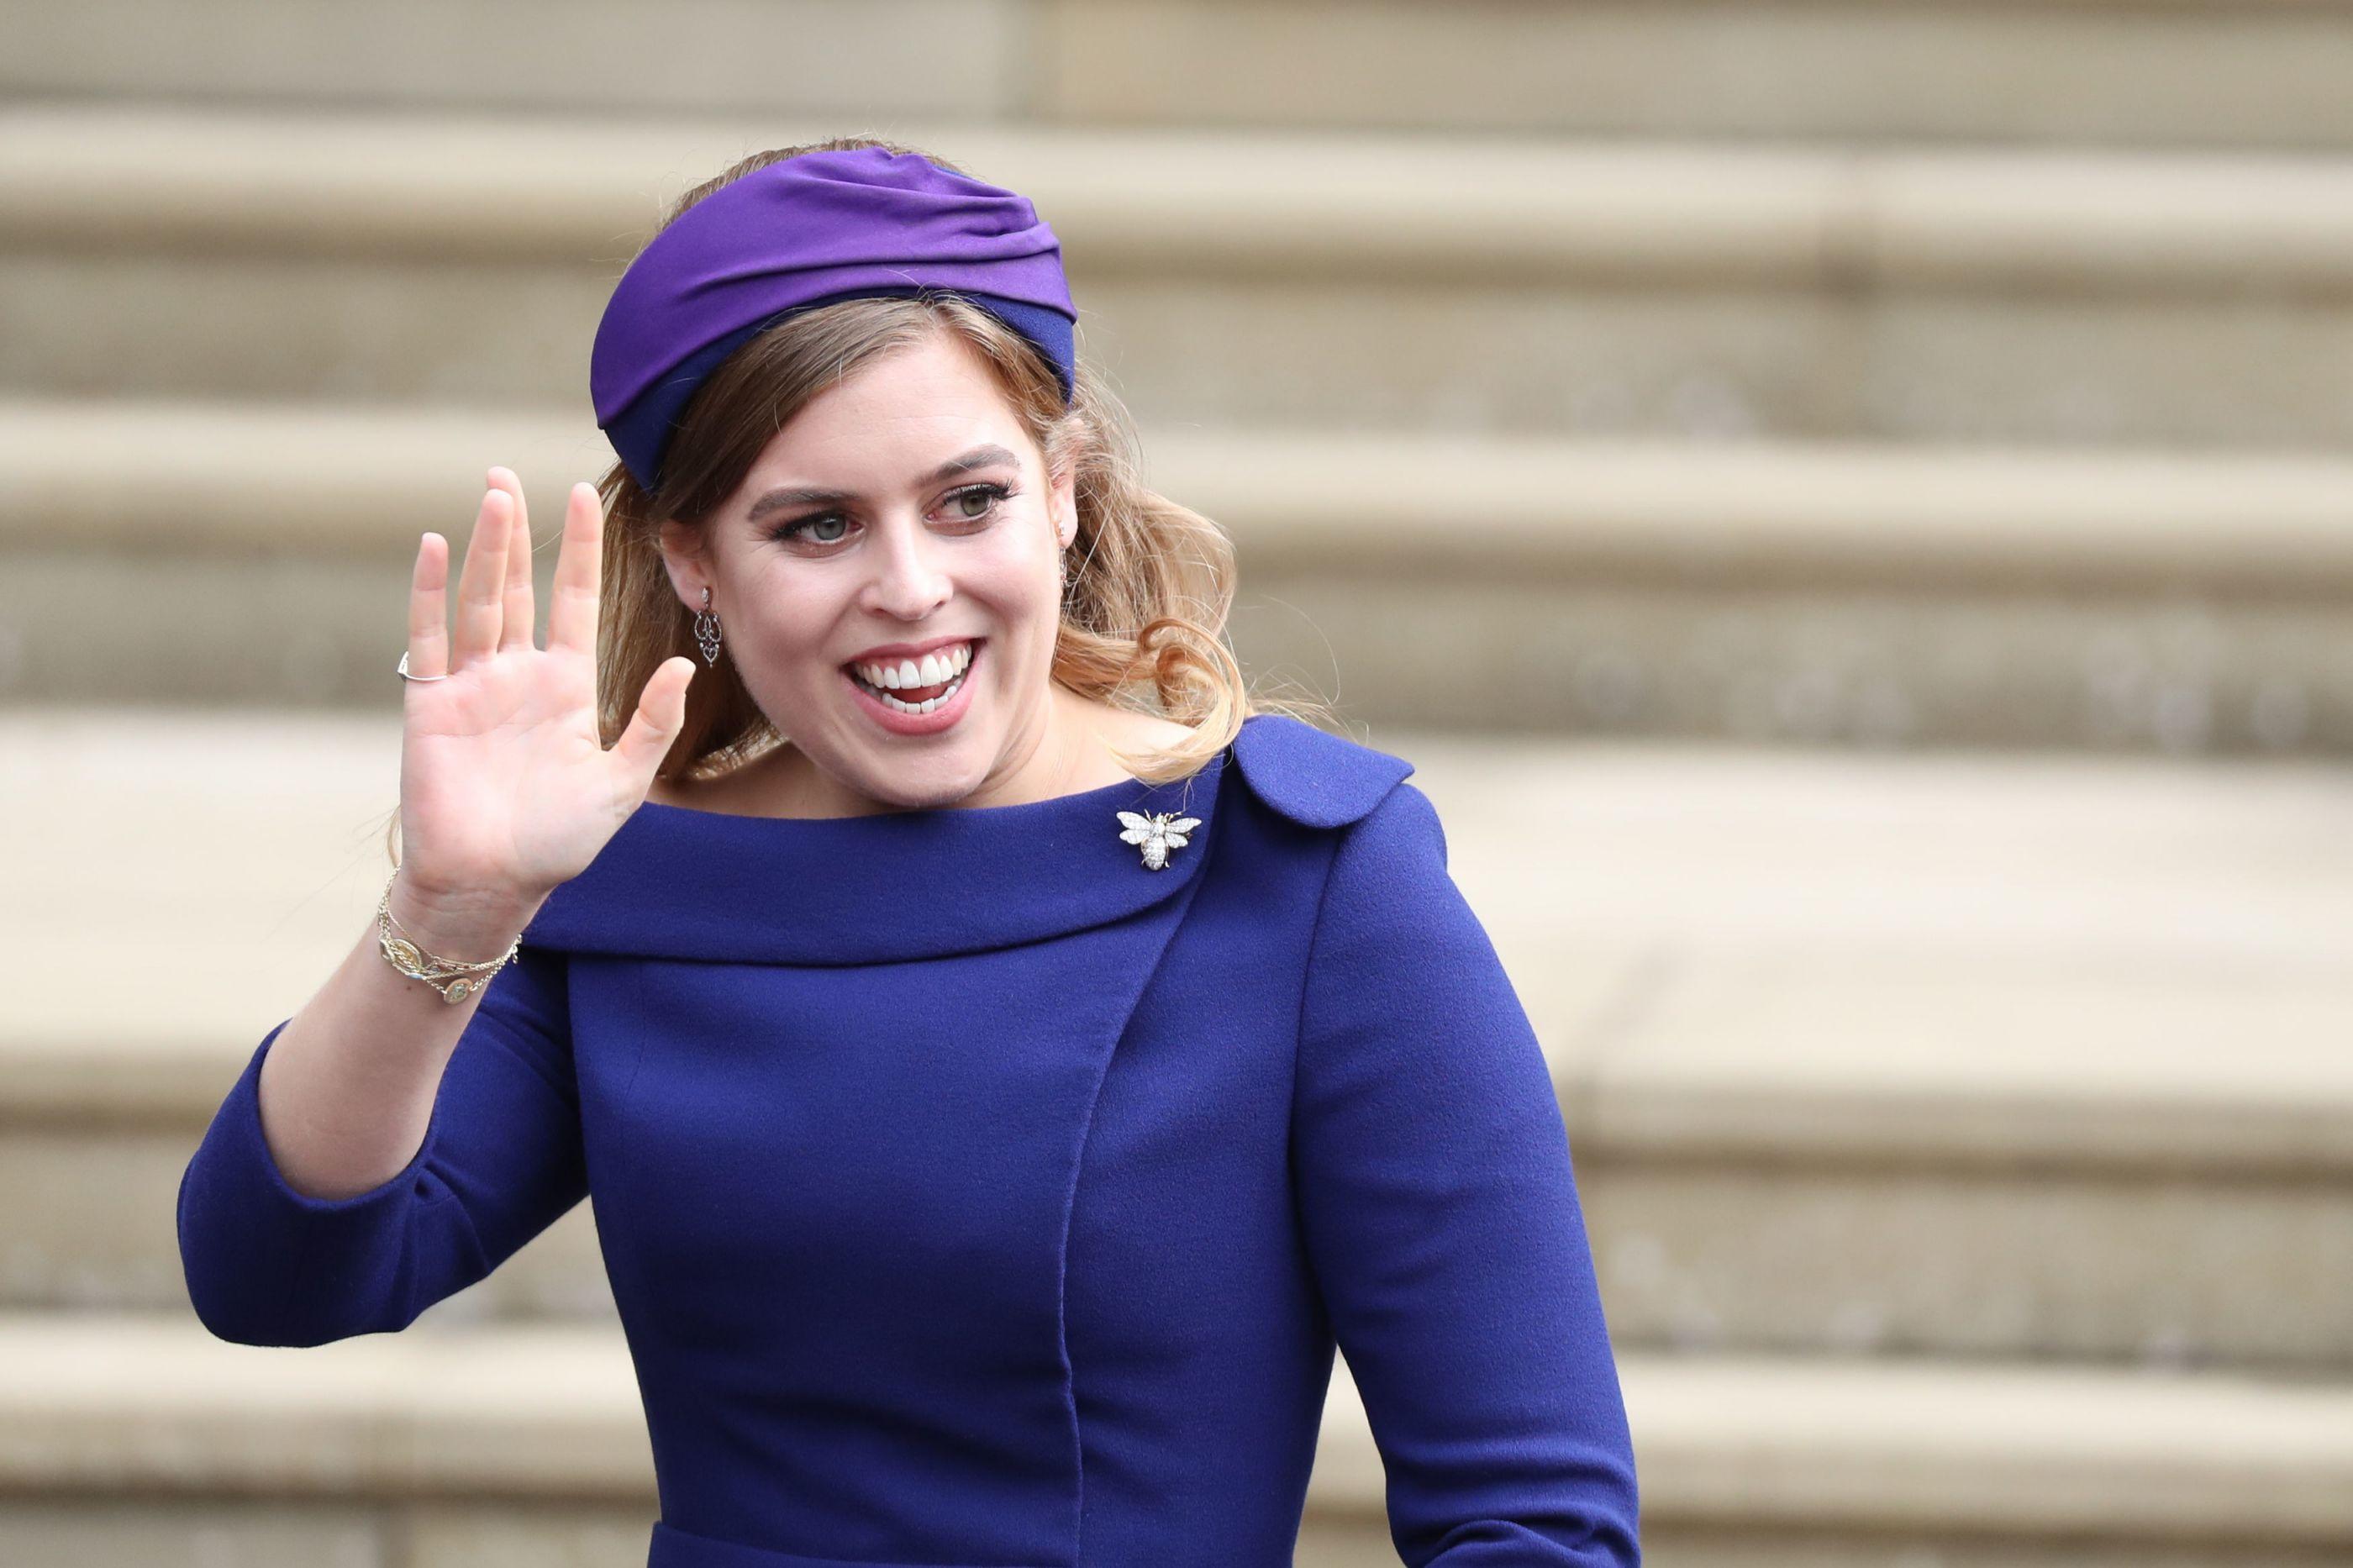 Princesa Beatrice transformou-se num unicórnio da realeza no Halloween